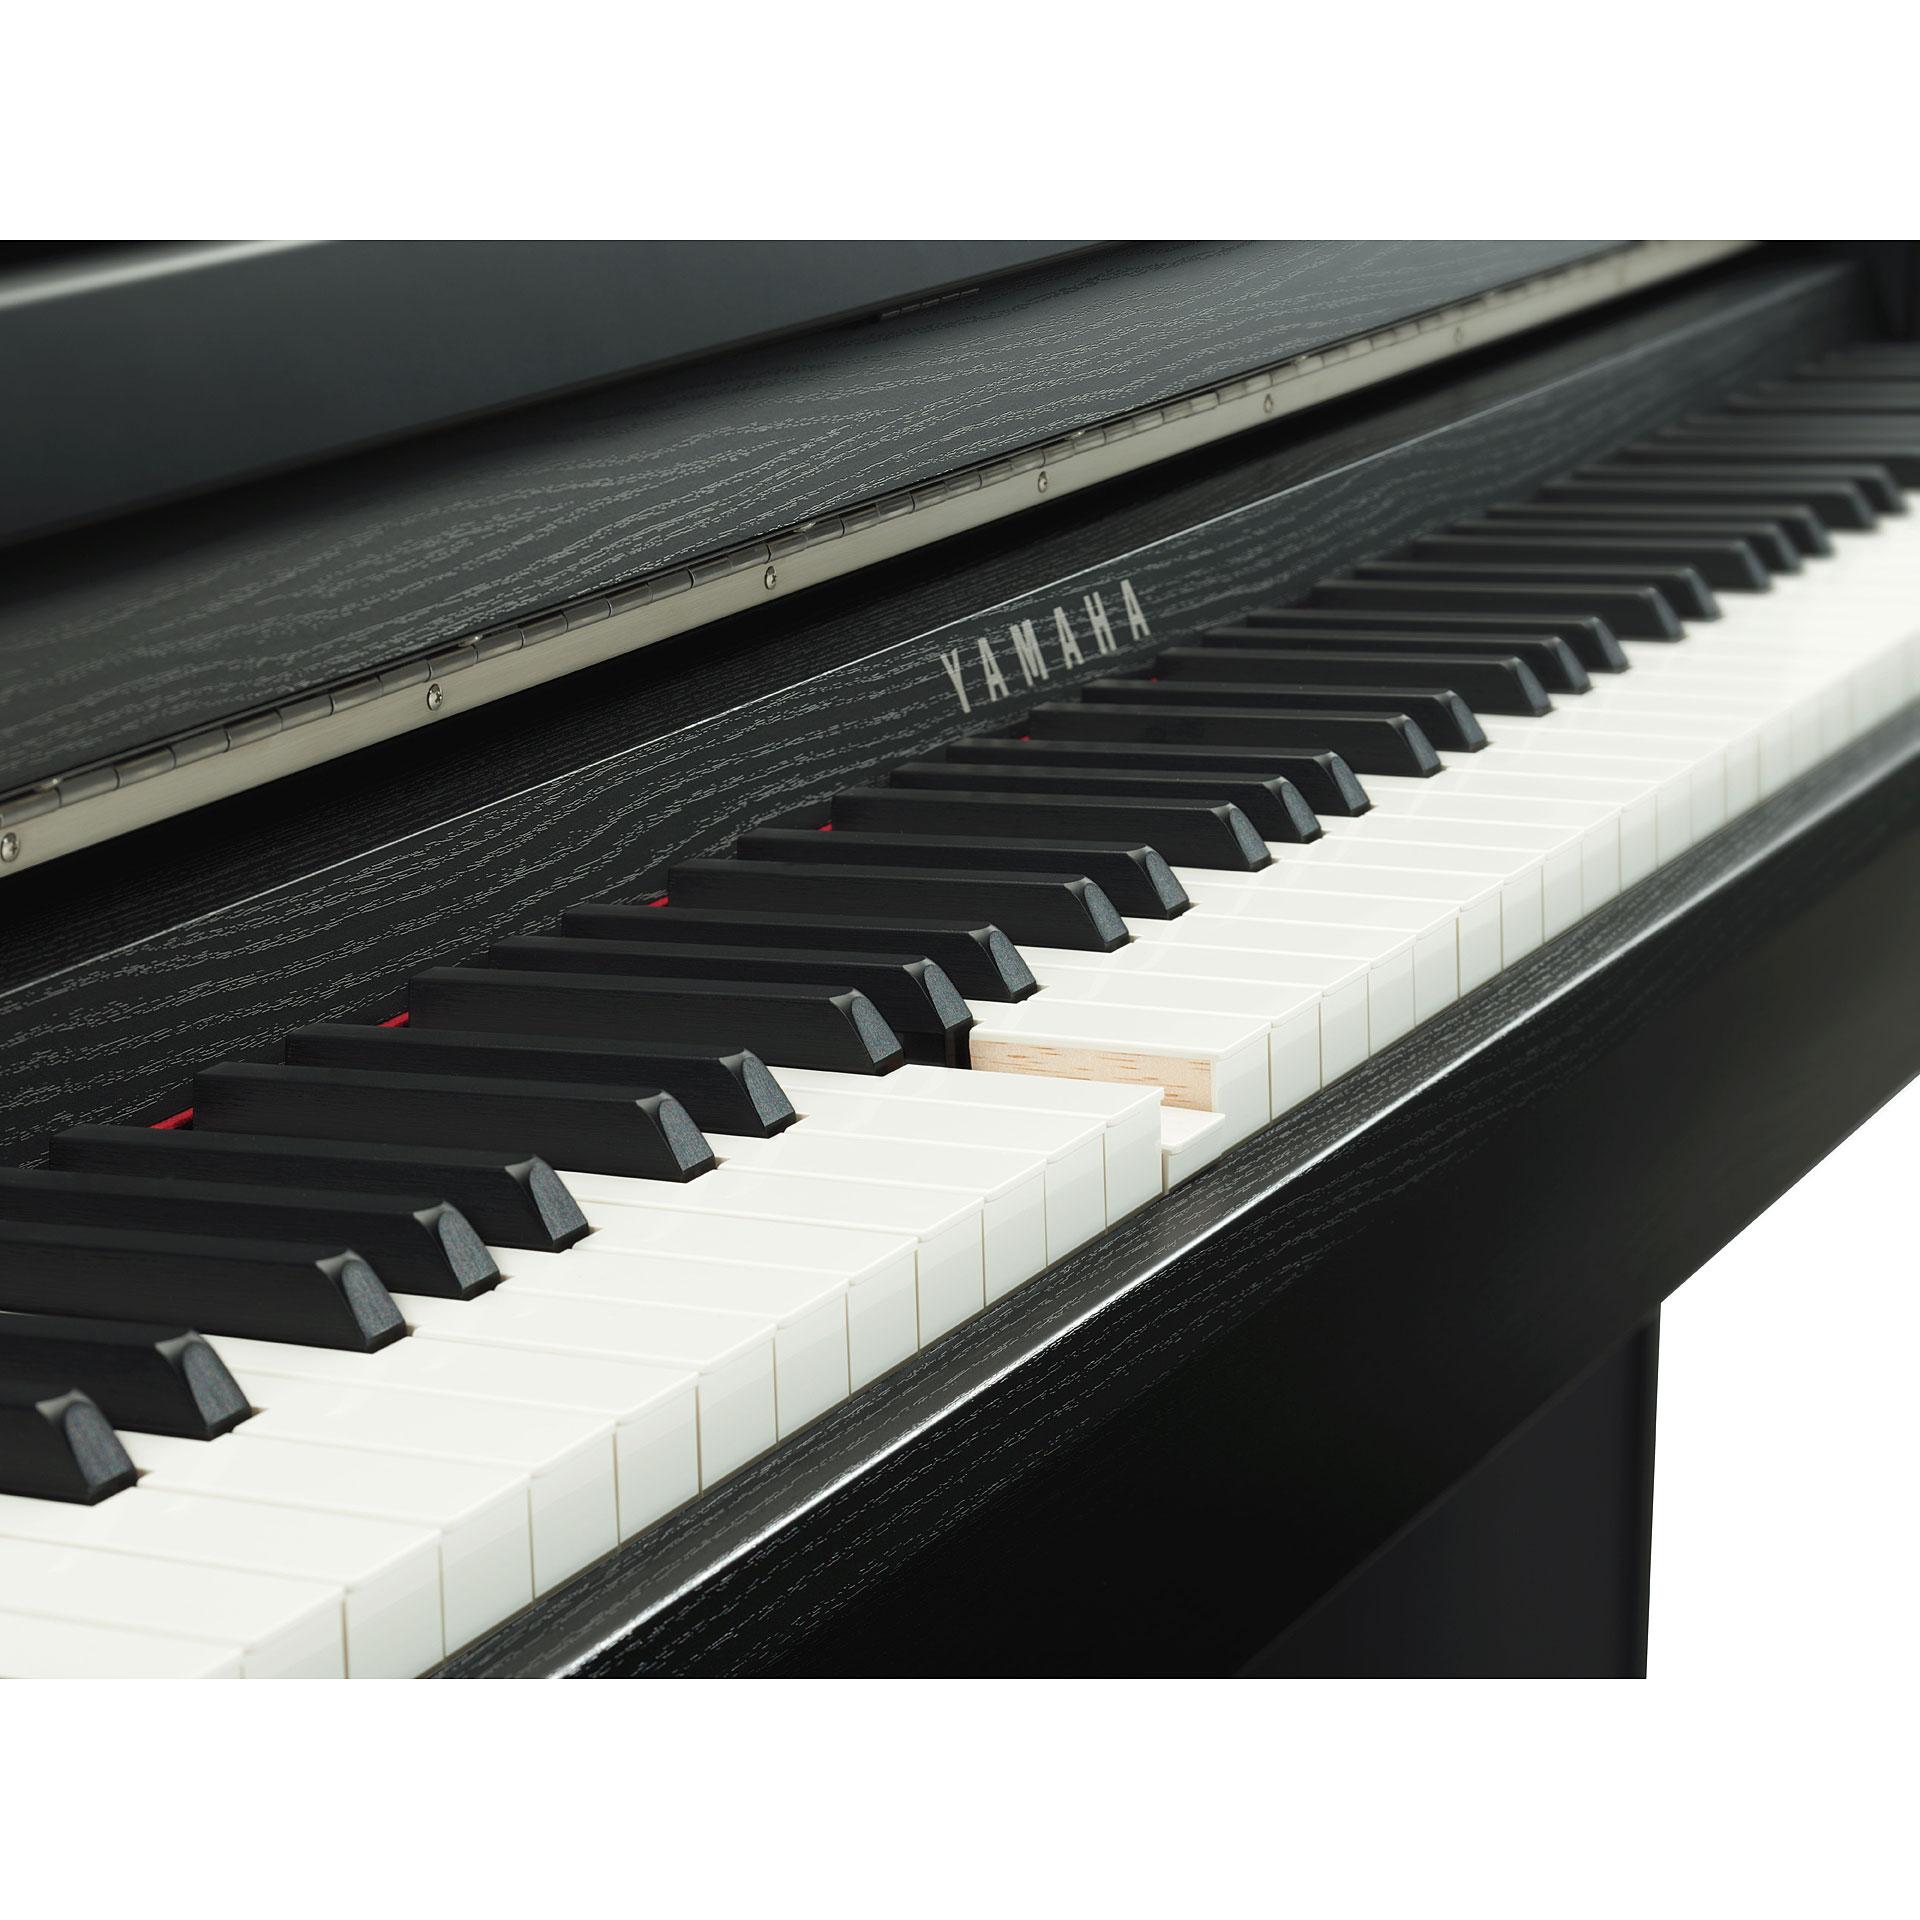 yamaha clavinova clp 685b digital piano. Black Bedroom Furniture Sets. Home Design Ideas